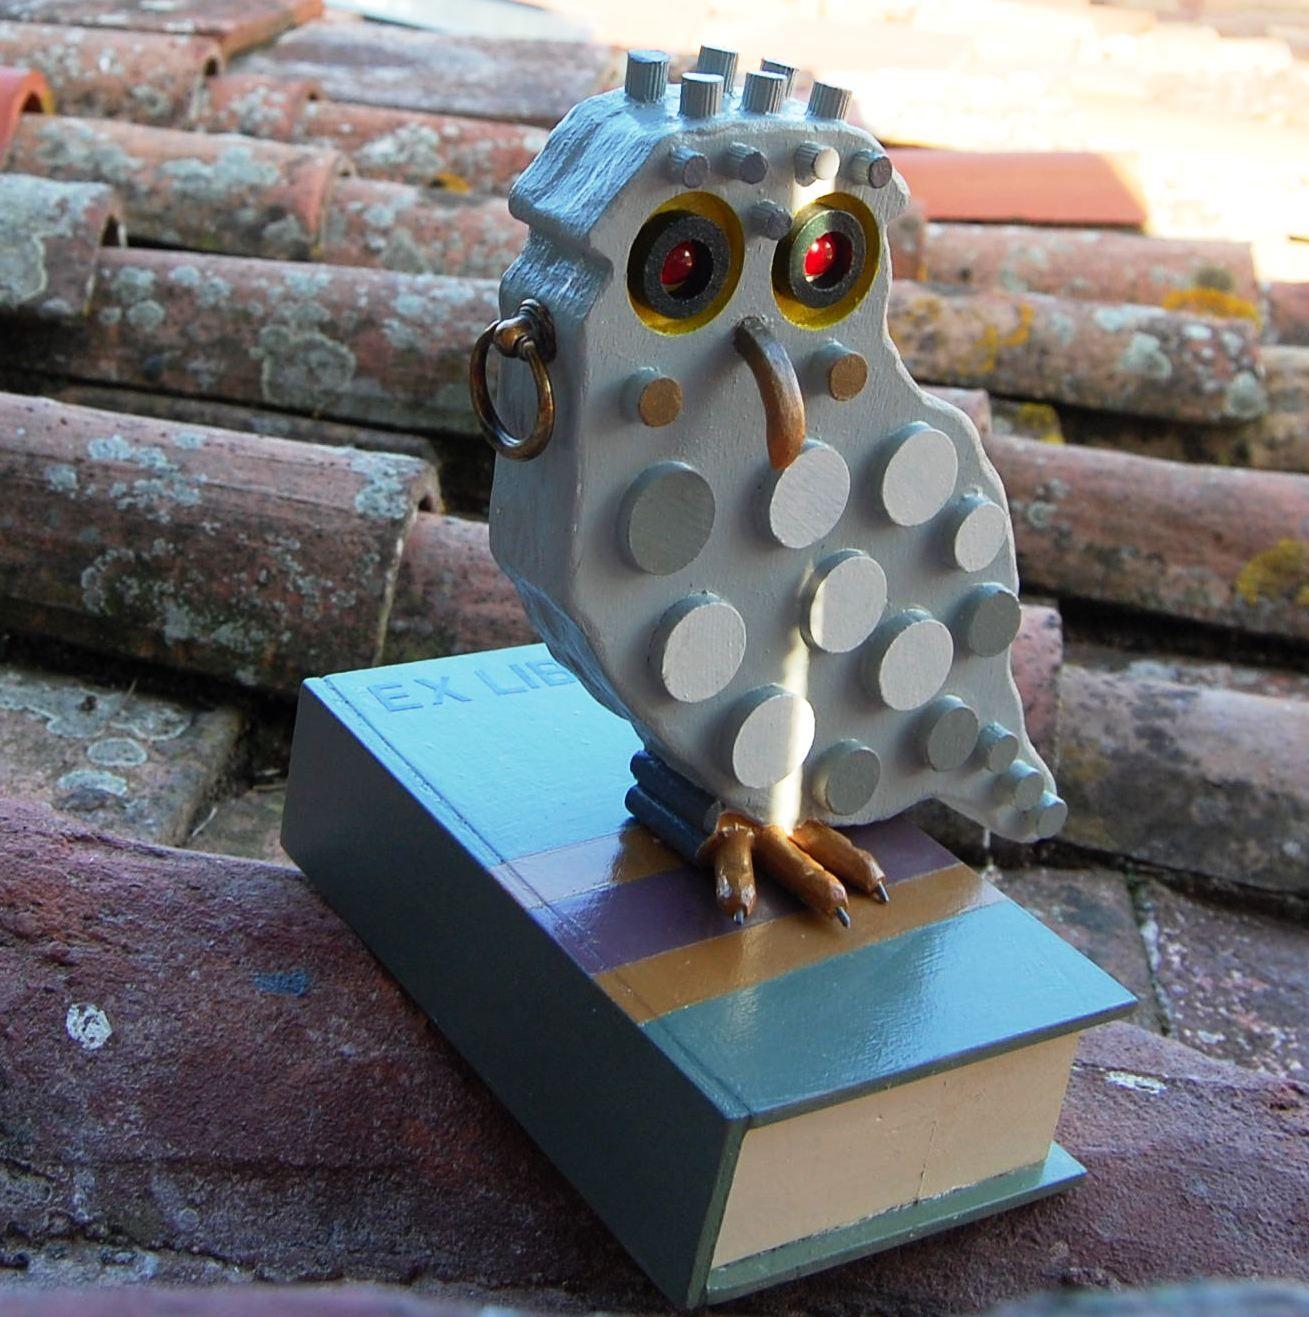 2015- Ex libris (civetta) legno dipinto e materiali vari, cm 27x20x22